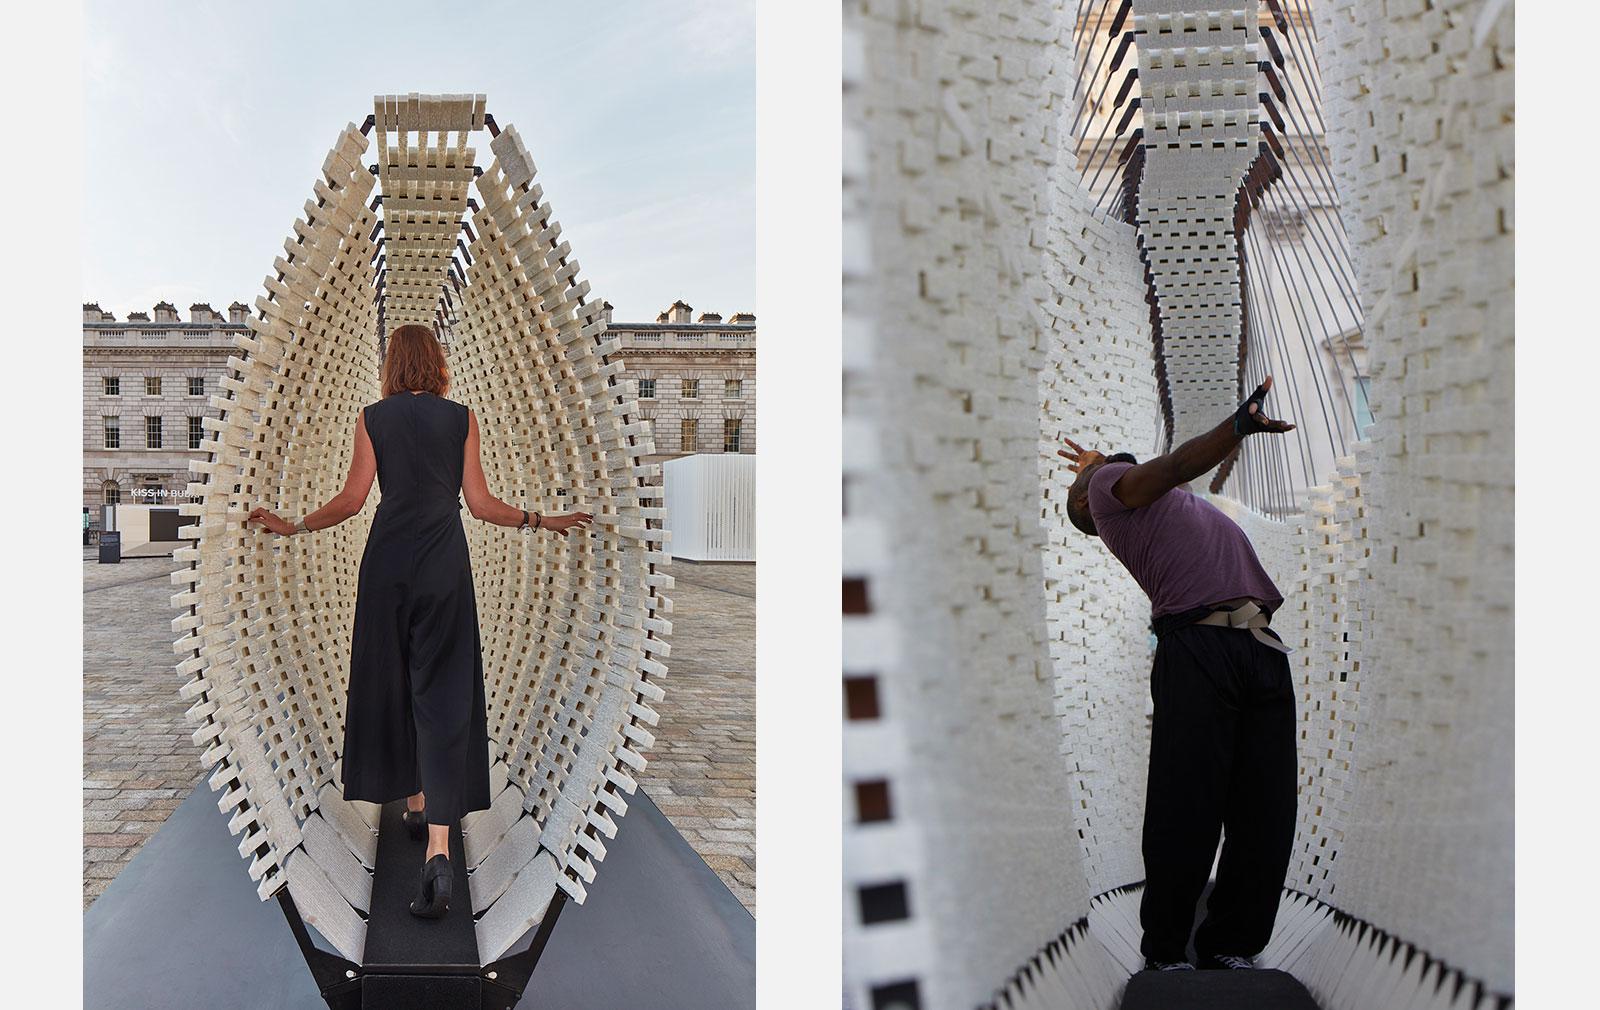 Greek pavilion at the London Design Biennale